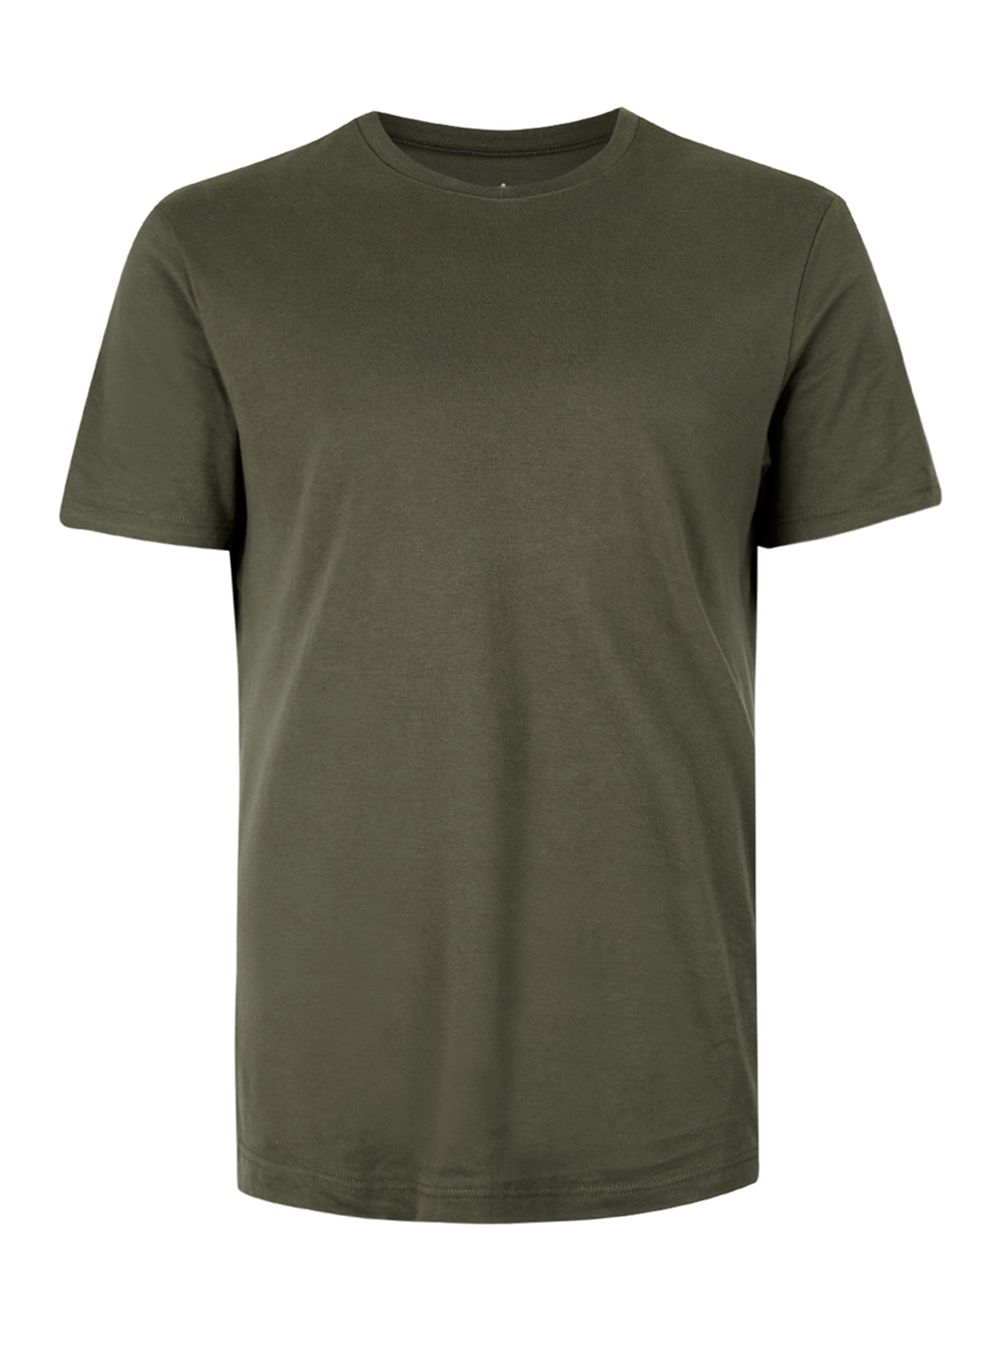 Topman Green T-Shirt